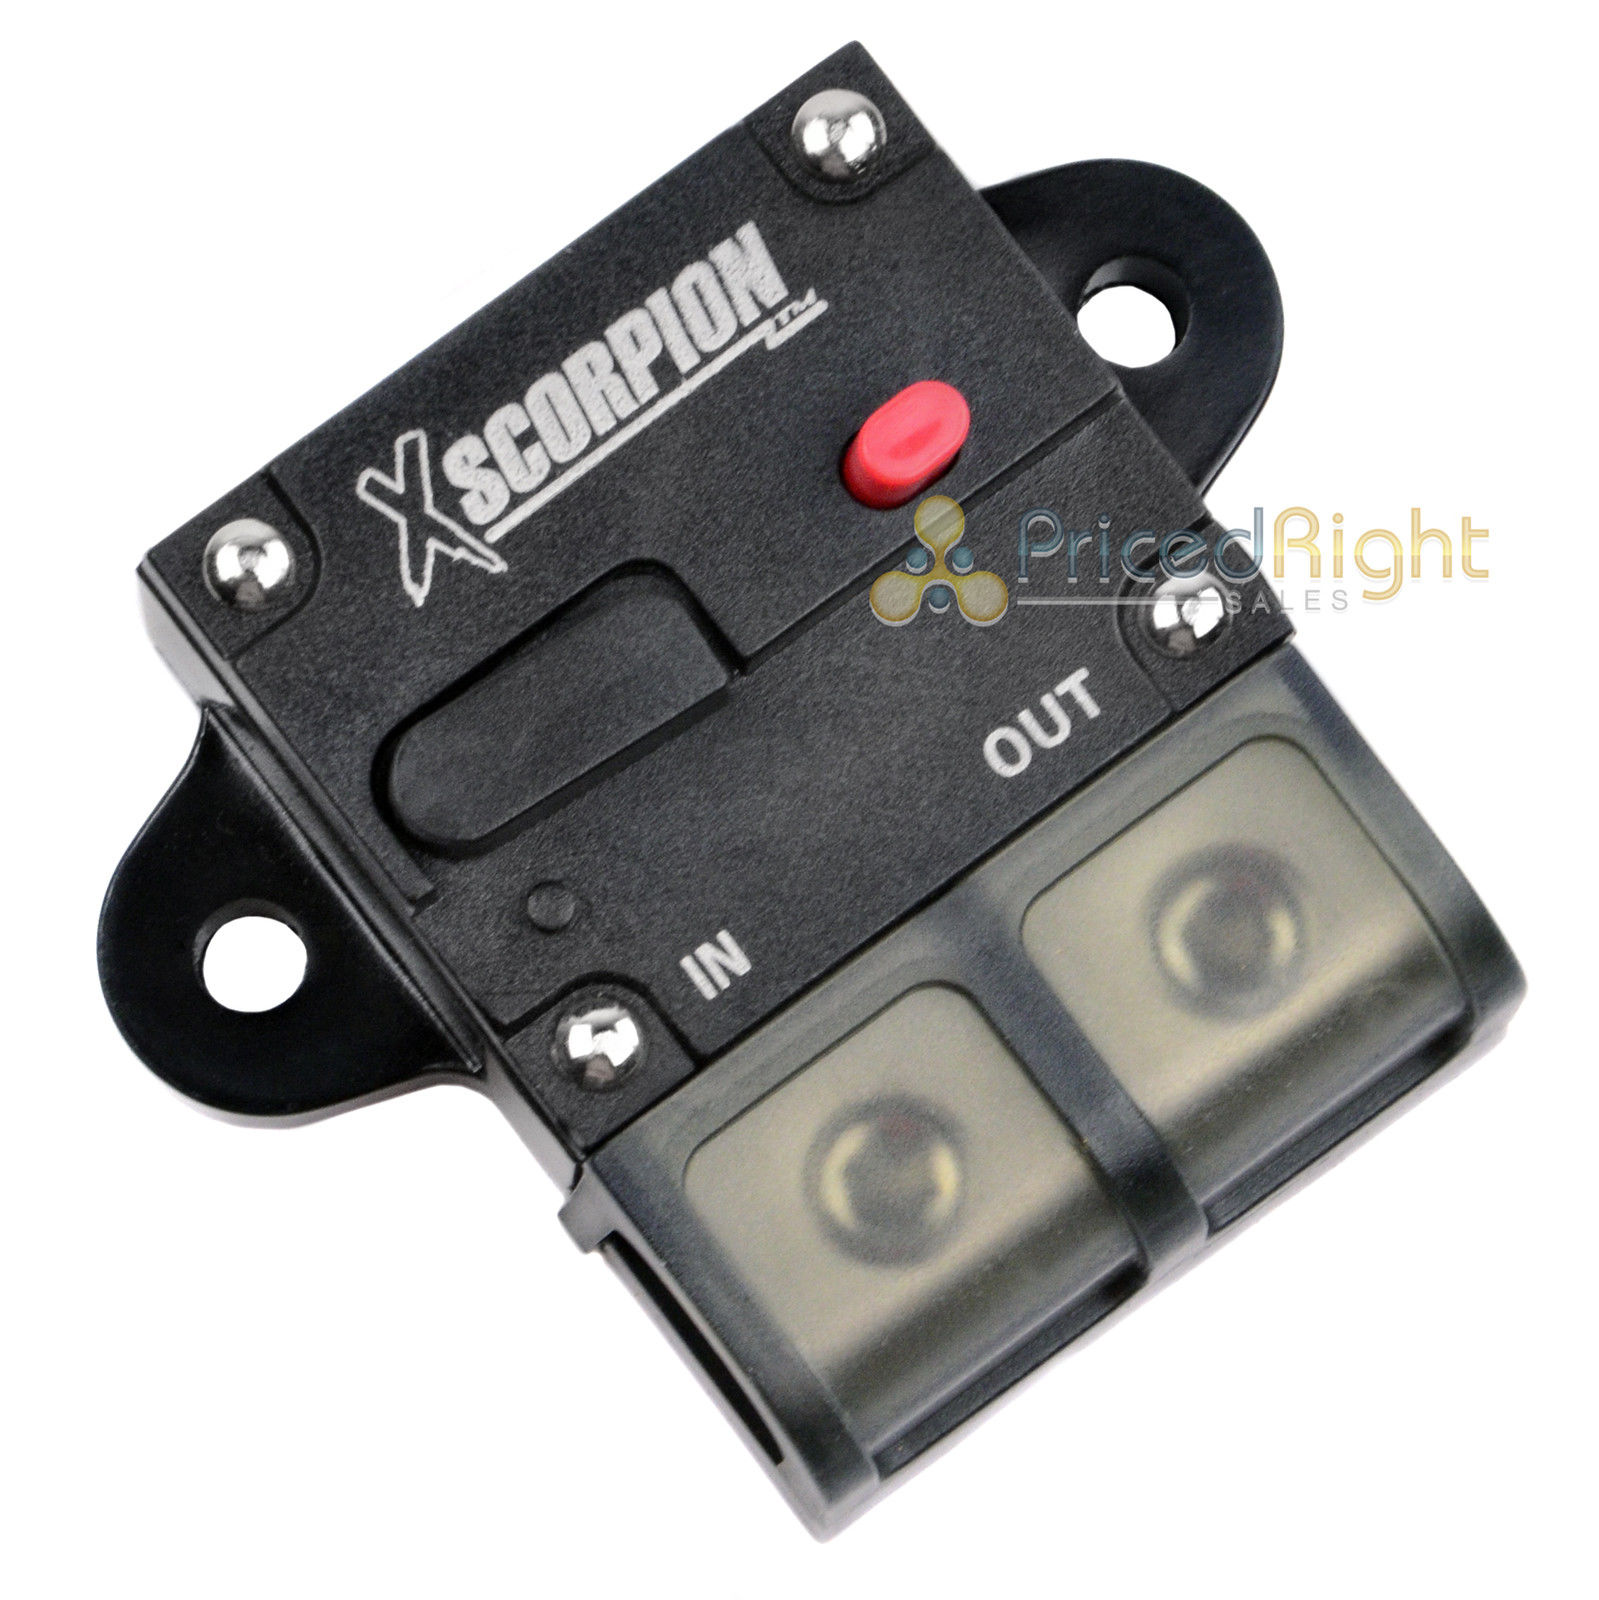 12v 150 Amp Circuit Breaker 1 2 4 Gauge In Out Terminal Block Manual Bullz Car Audio Red Standard Amplifier Power Wiring Kit Reset